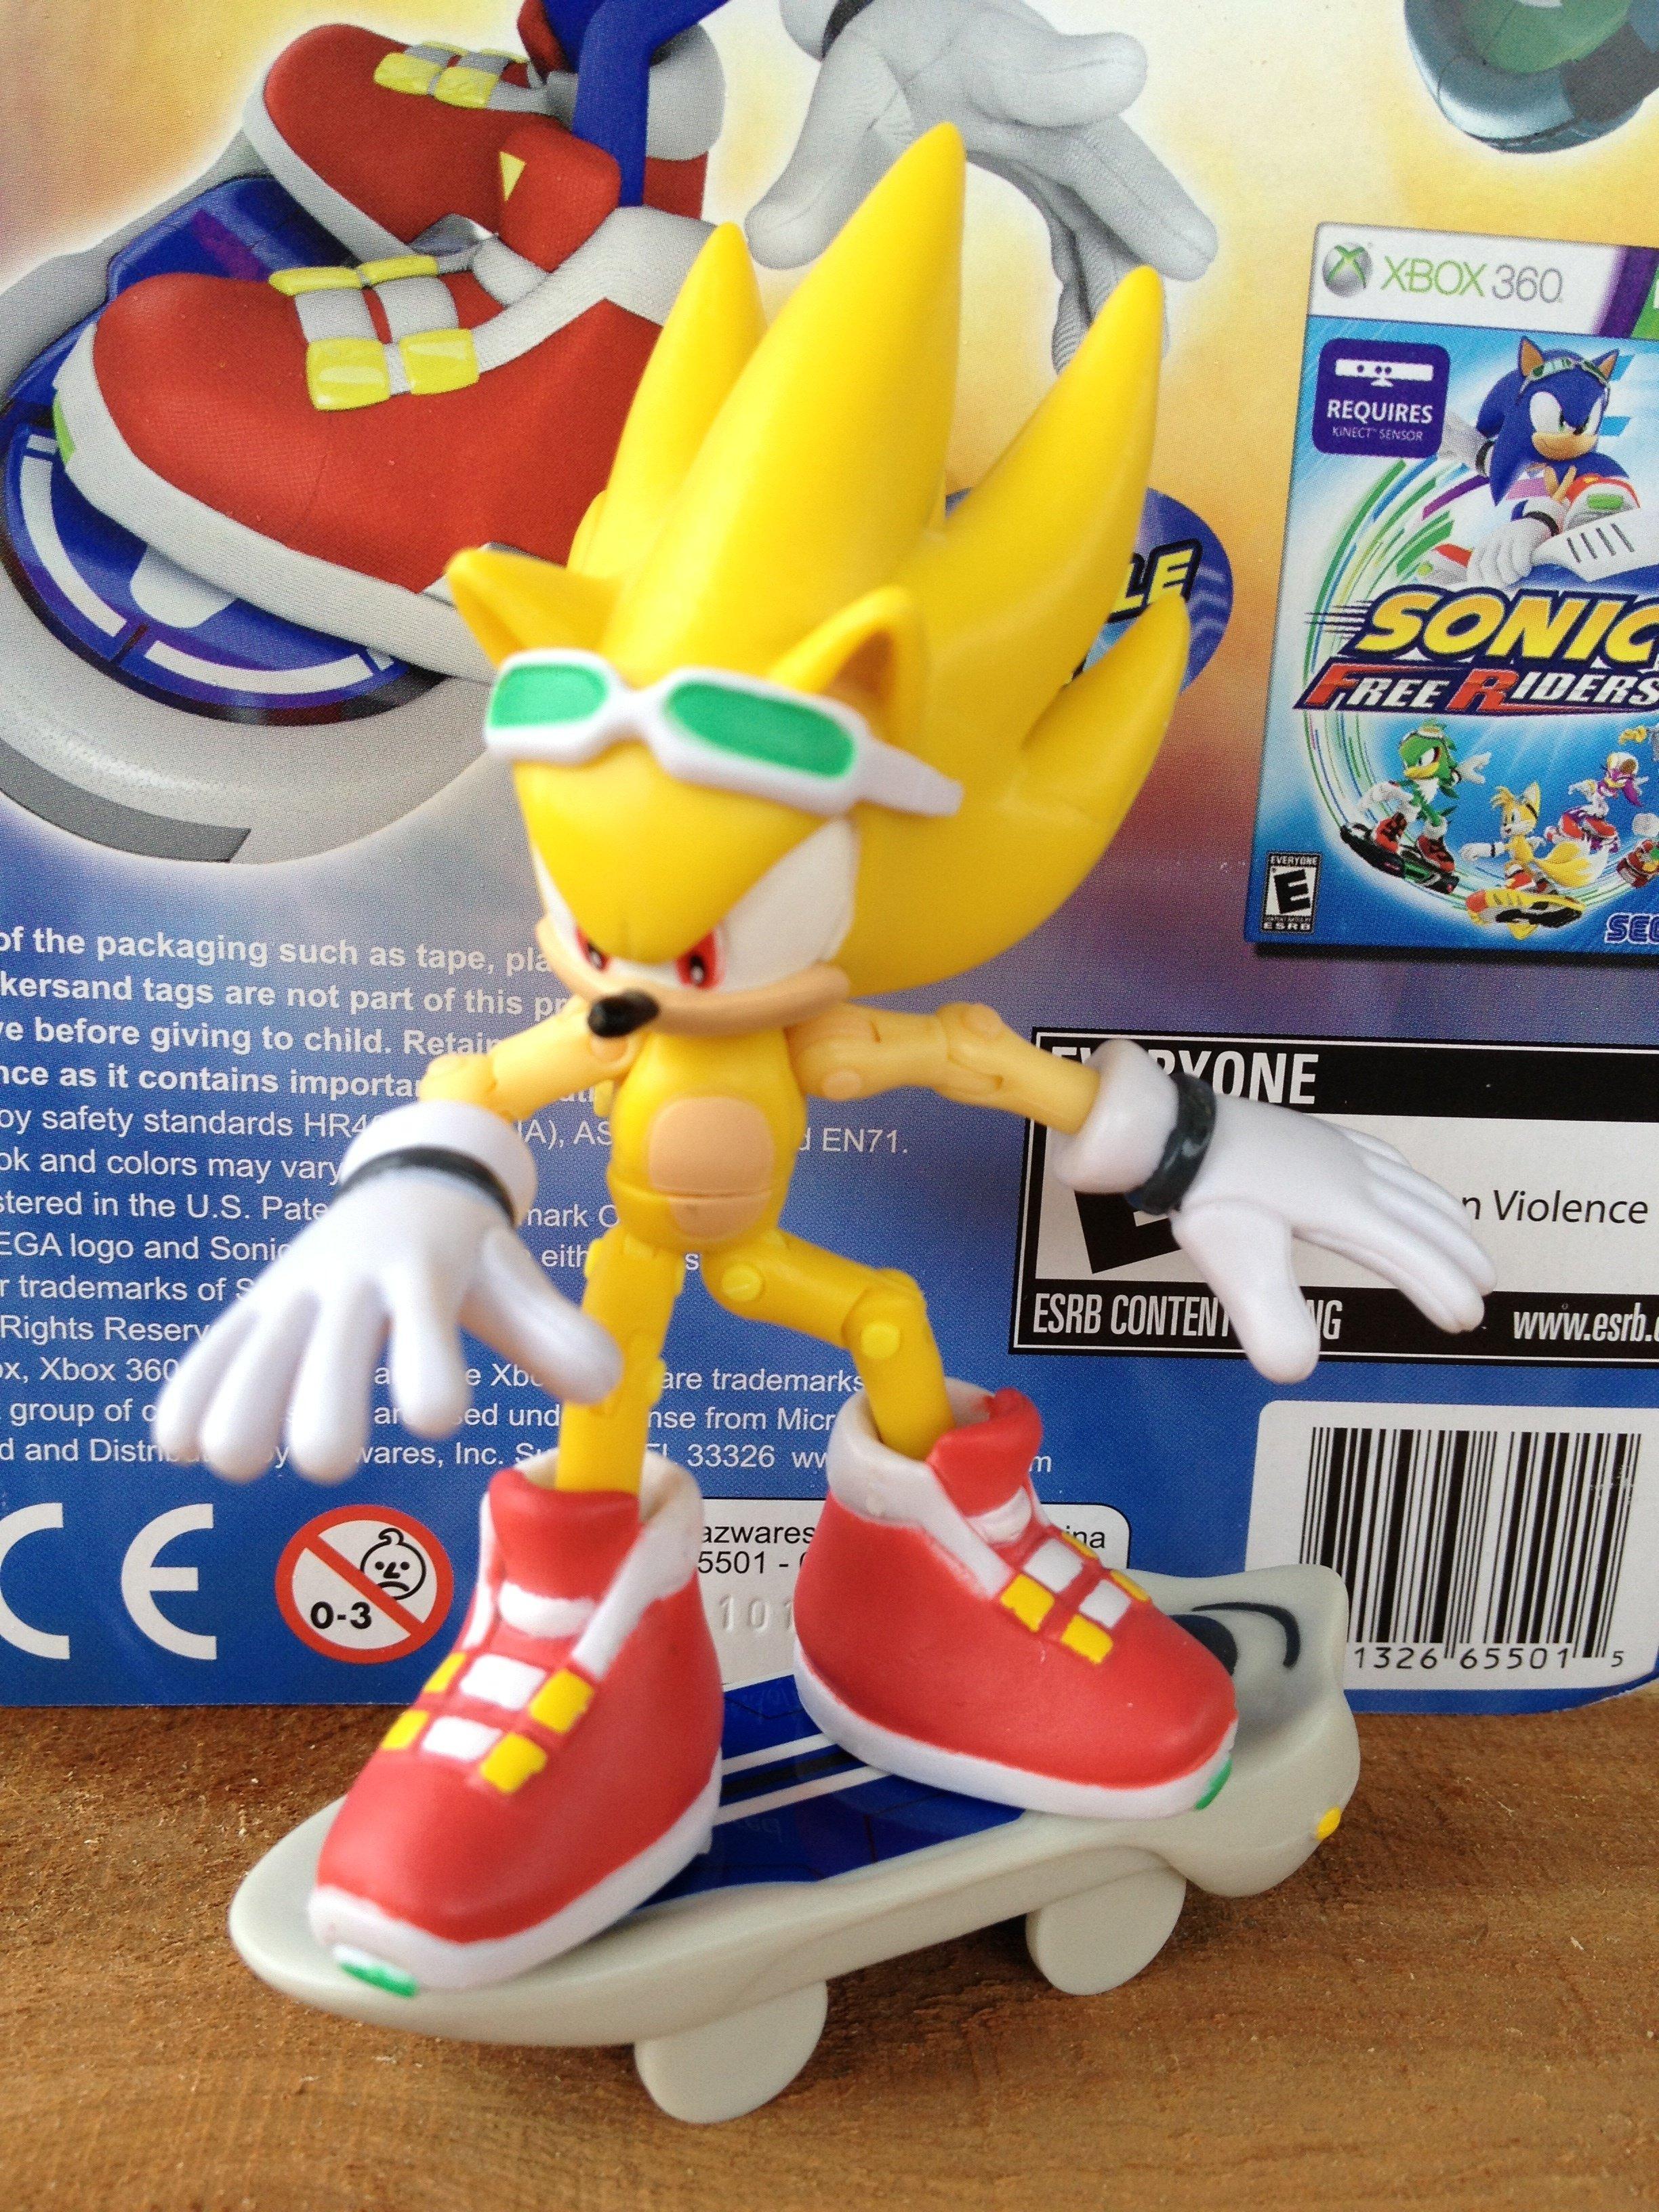 Custom Sonic Free Riders Super Sonic Figure By Hypershadow92 On Deviantart